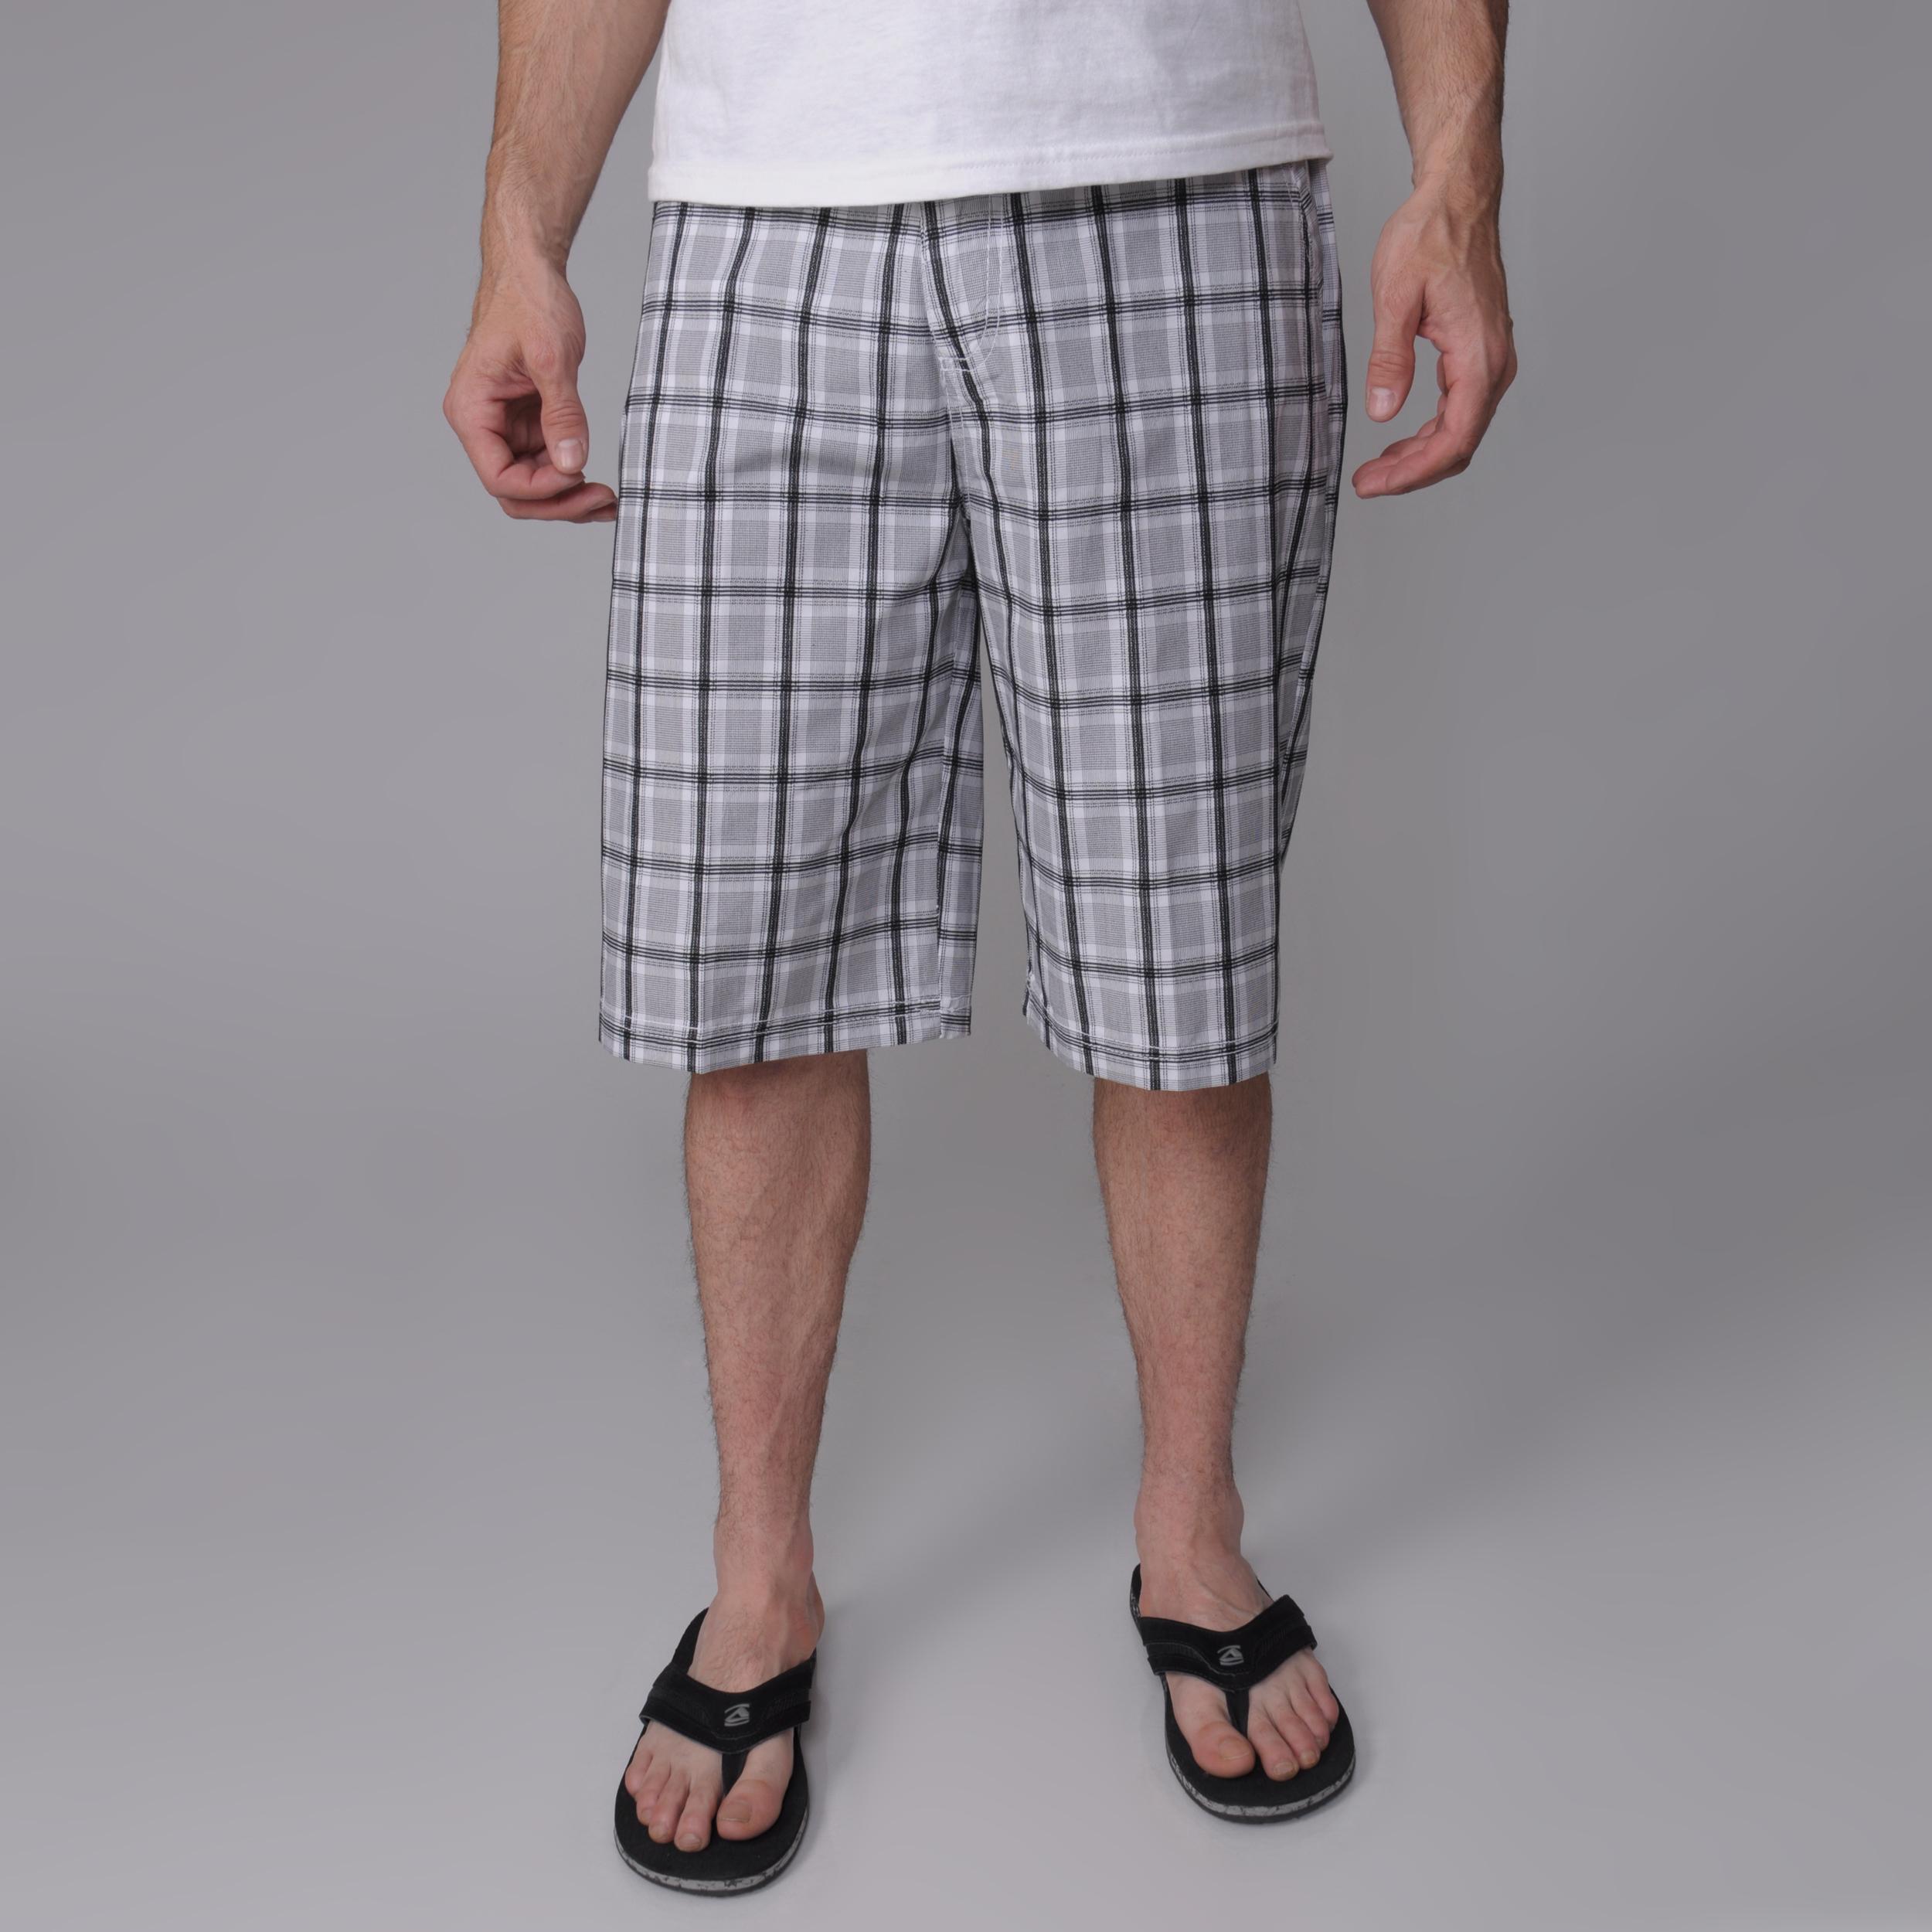 Black Gioberti by Boston Traveler Men's Plaid Shorts